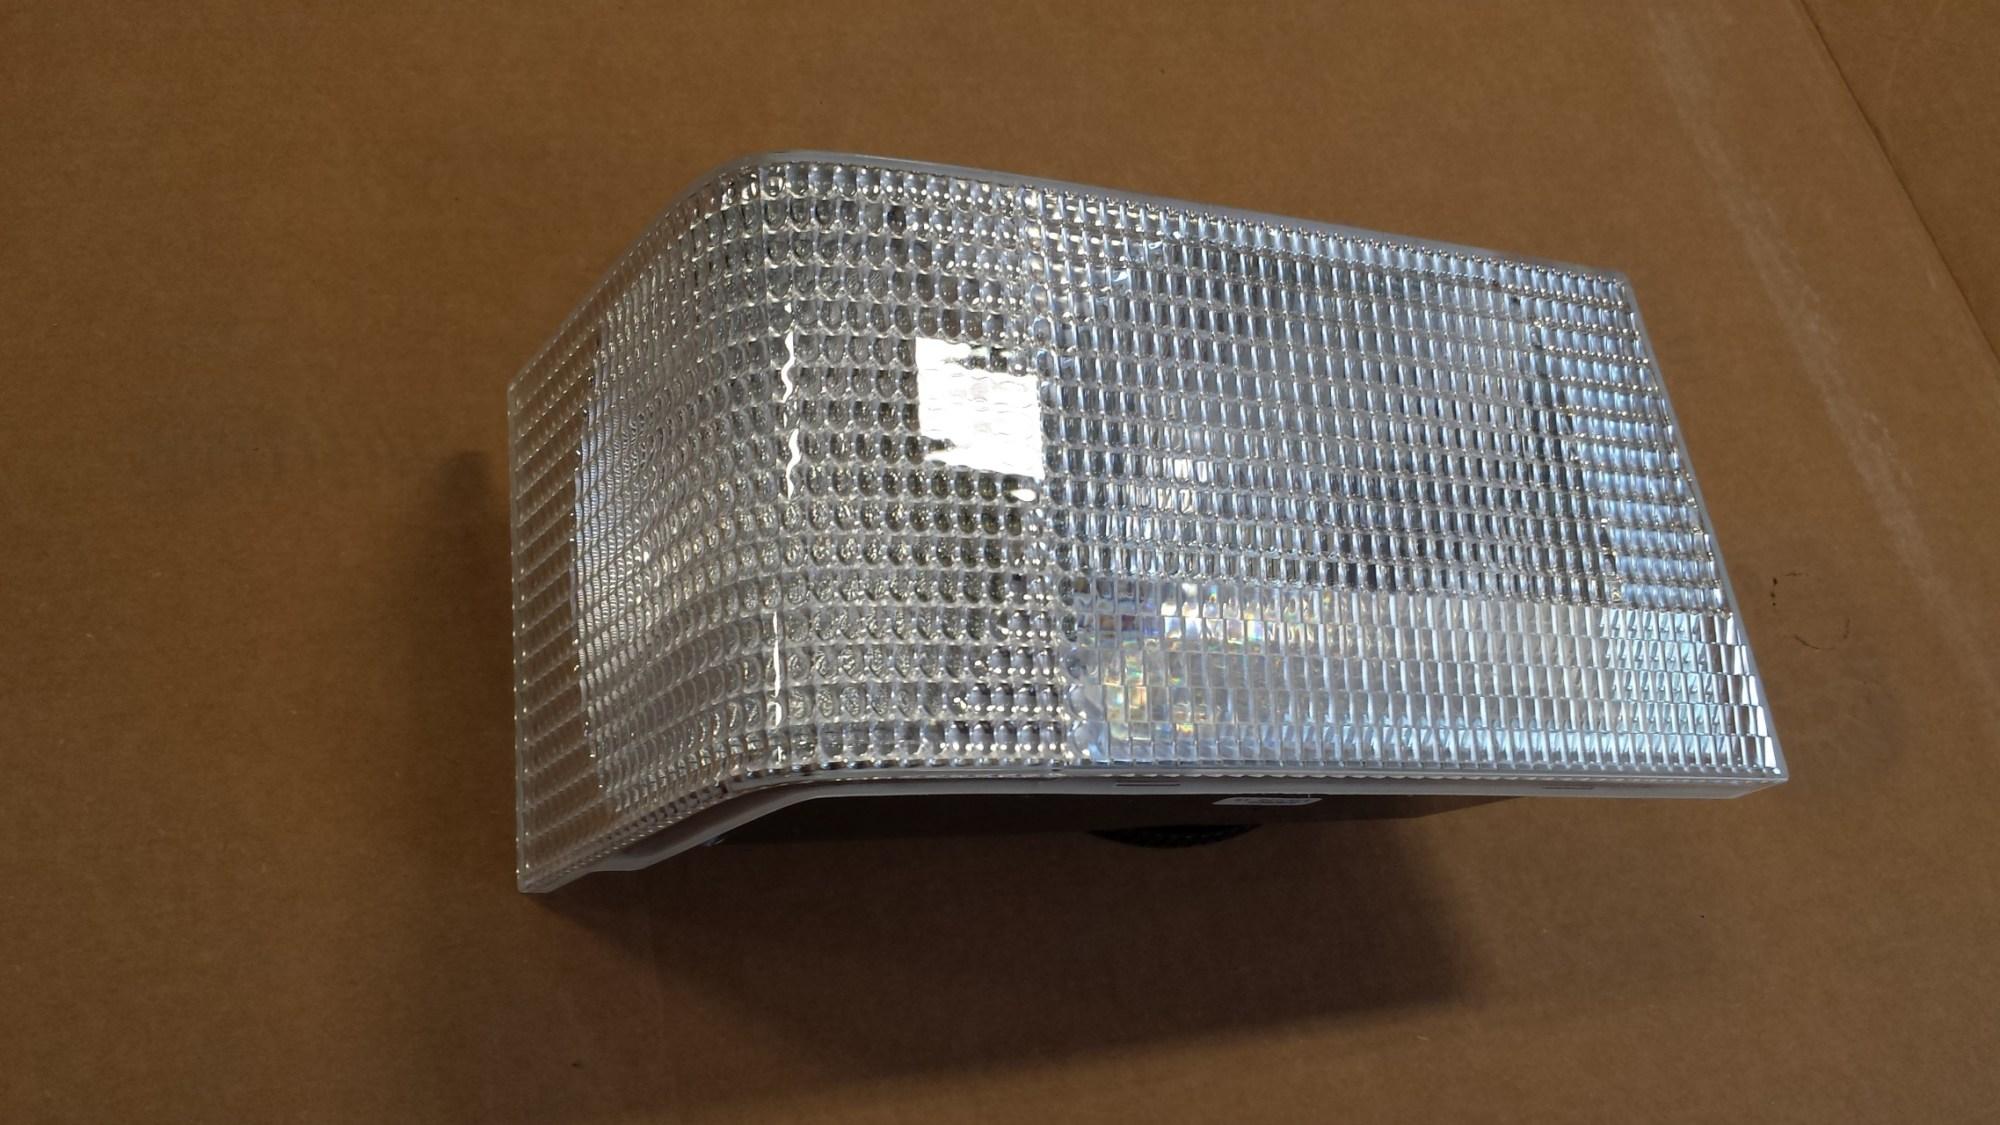 hight resolution of 91972c2 headlight right side